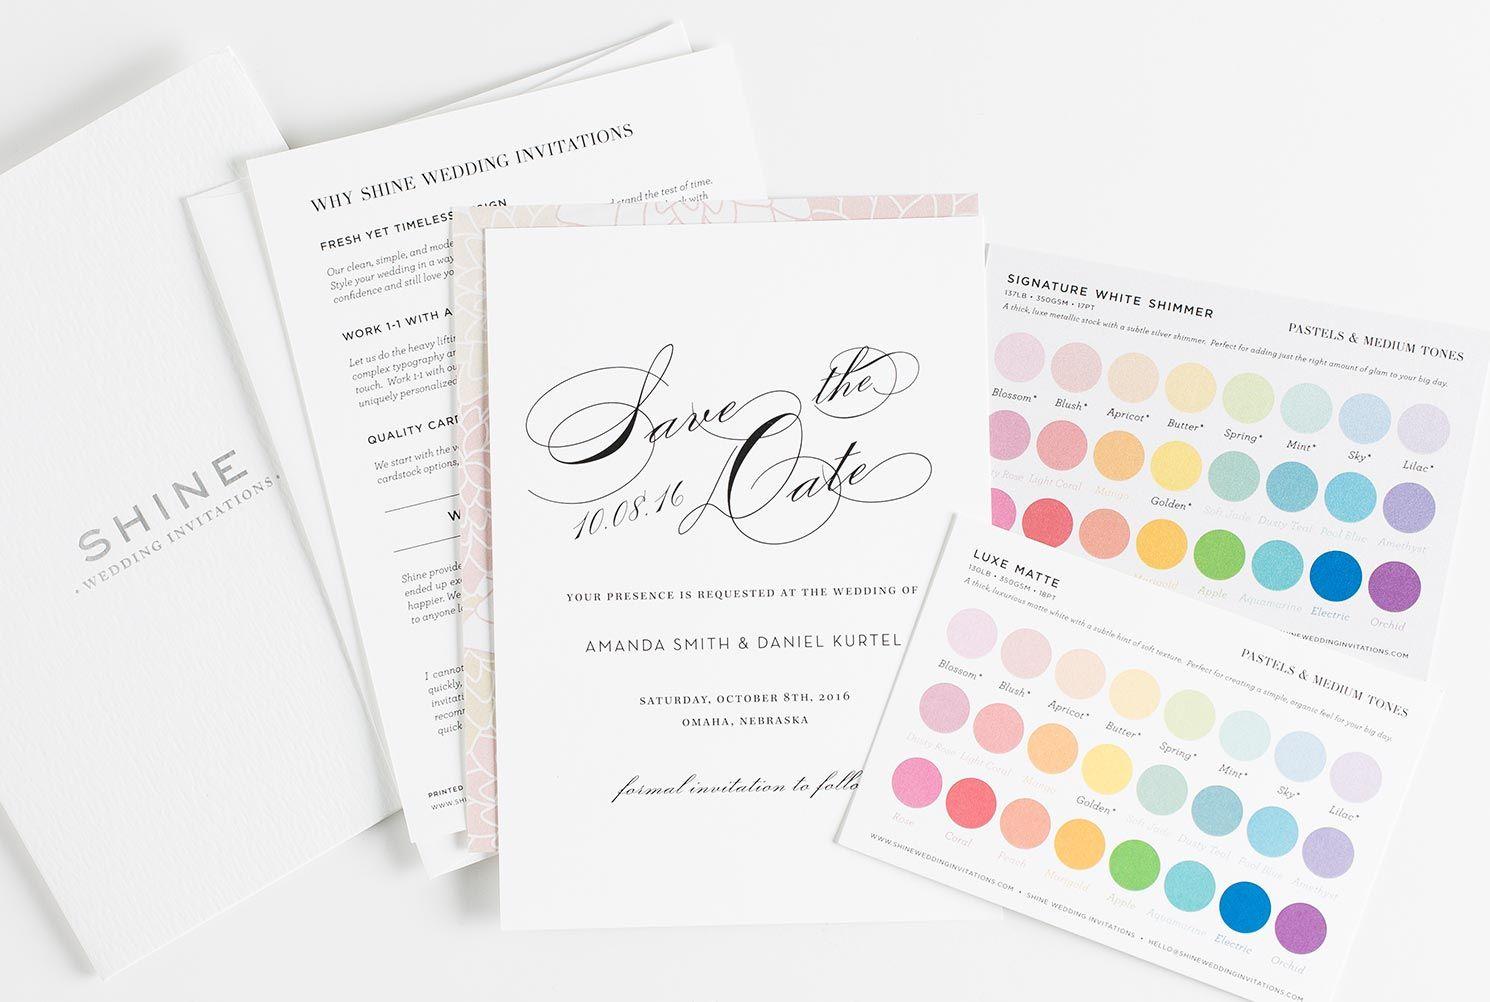 free wedding invitation sample | cards | Pinterest | Cards